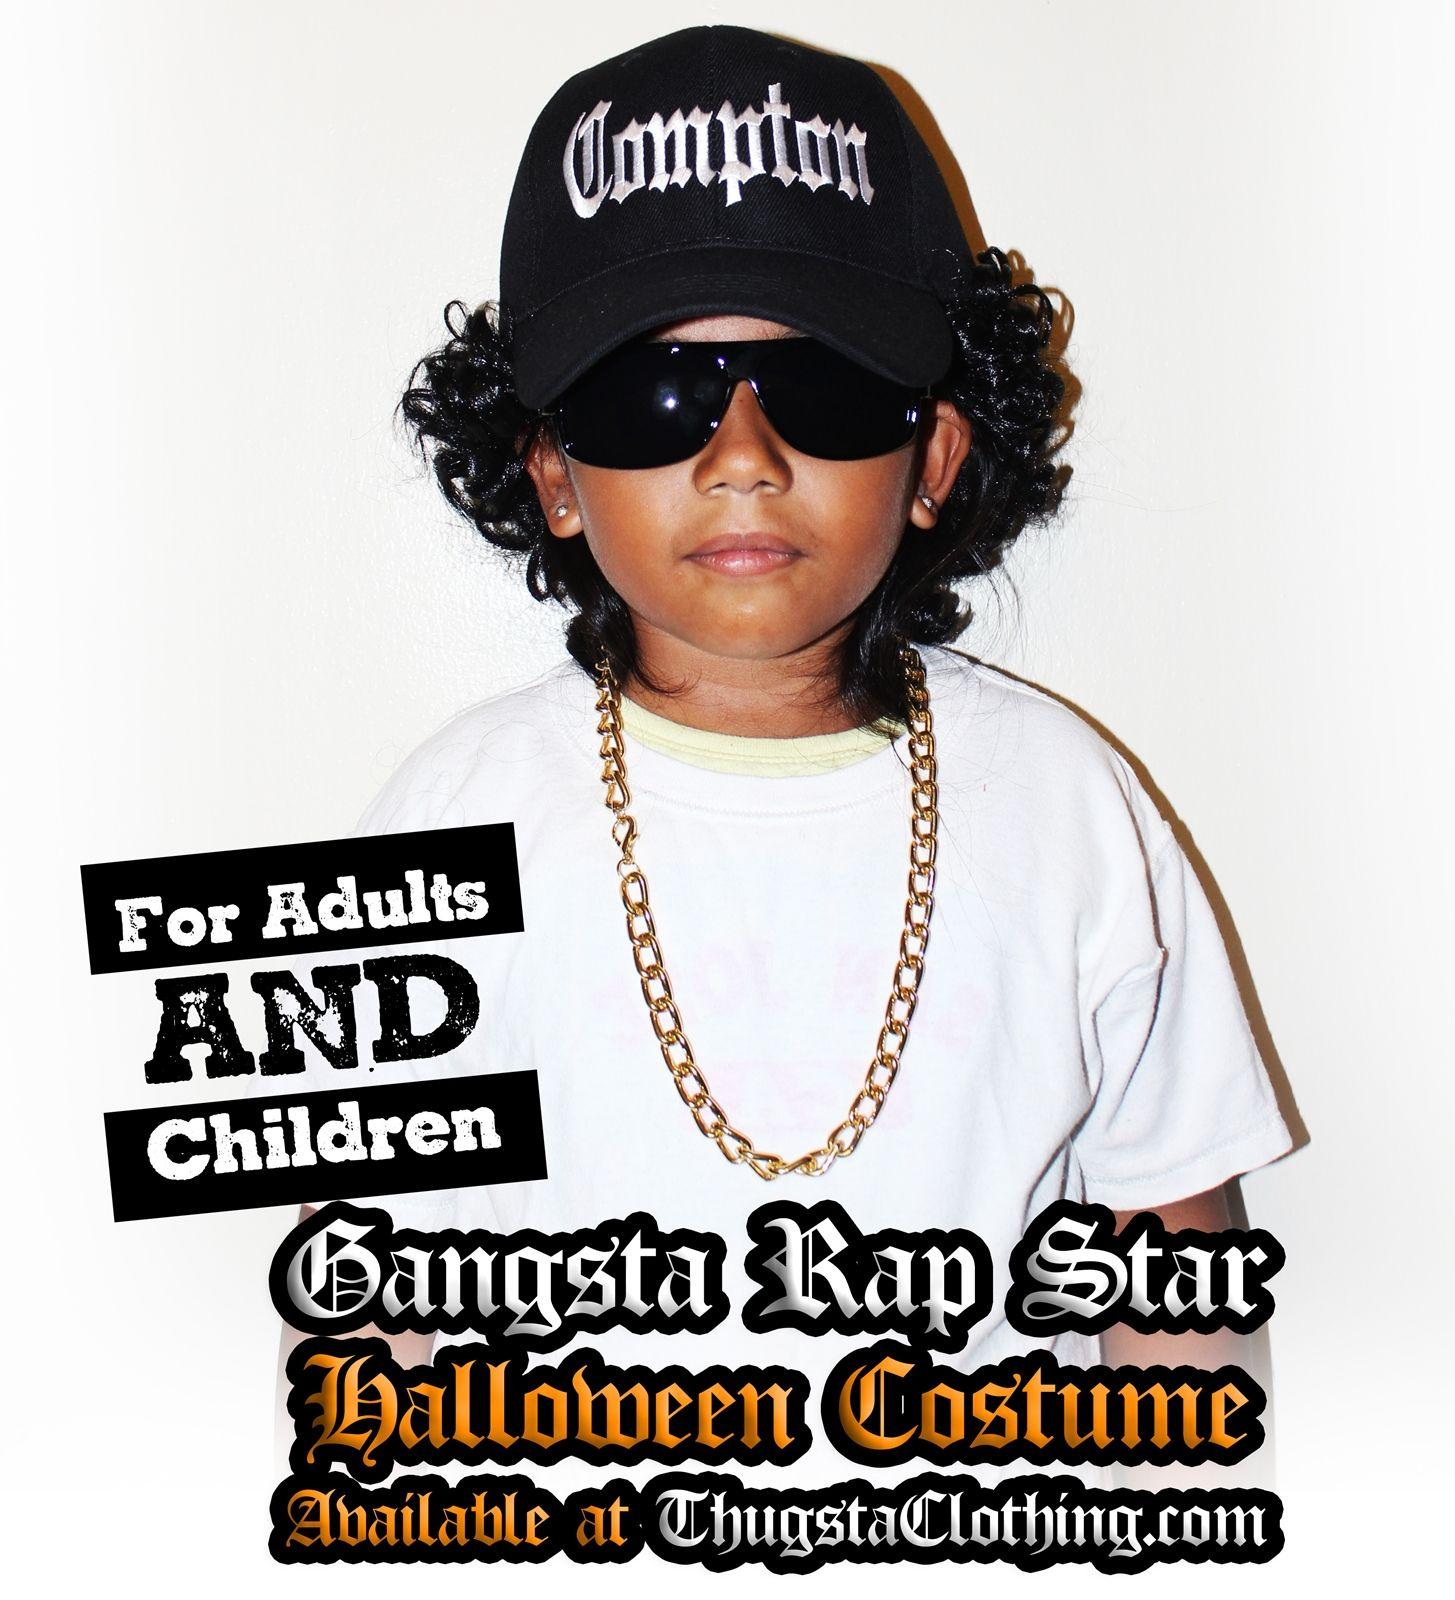 NWA Gangsta Rap star Halloween costume Eazy-e style   Eazy-E ...